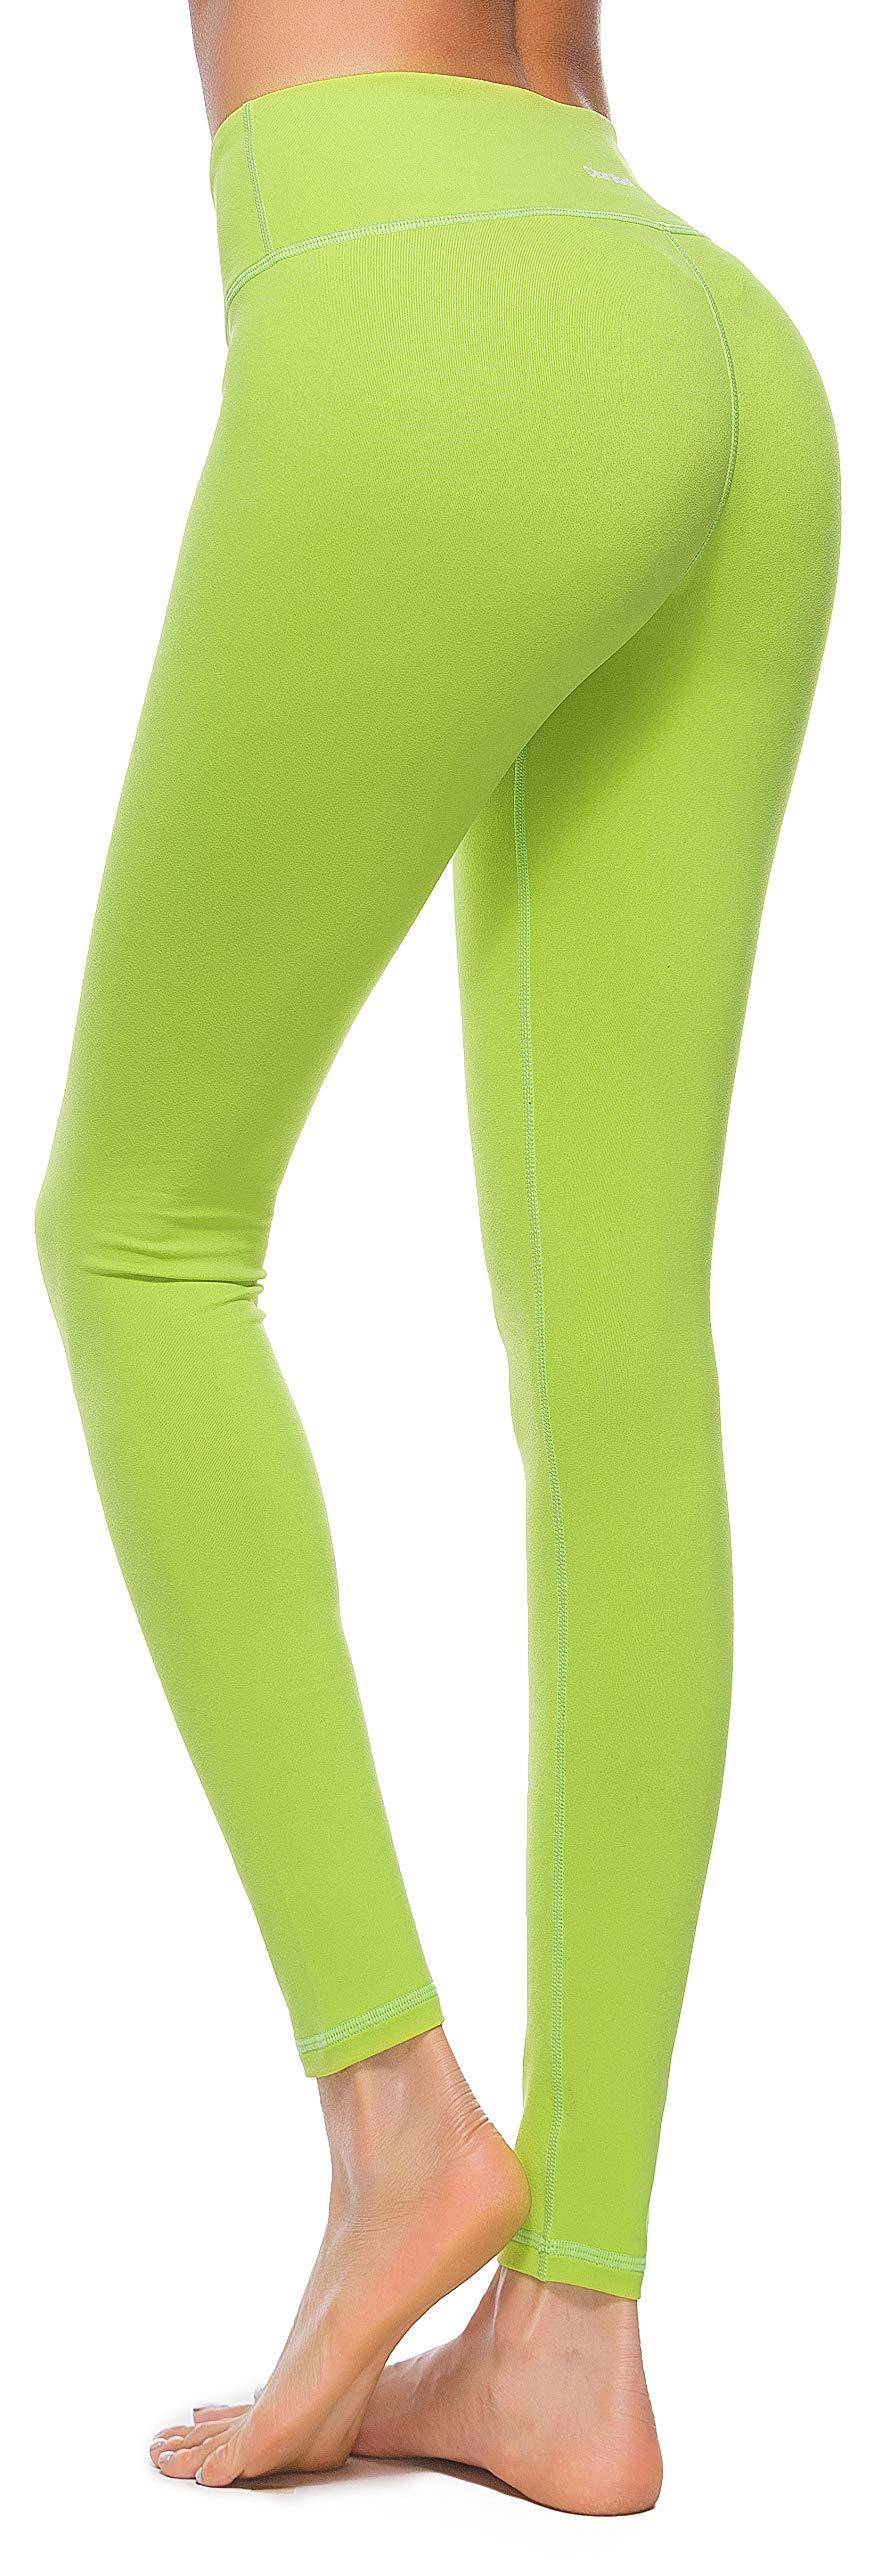 Womens Yoga Pants High Waist Yoga Workout Leggings Running Pants Tummy Control